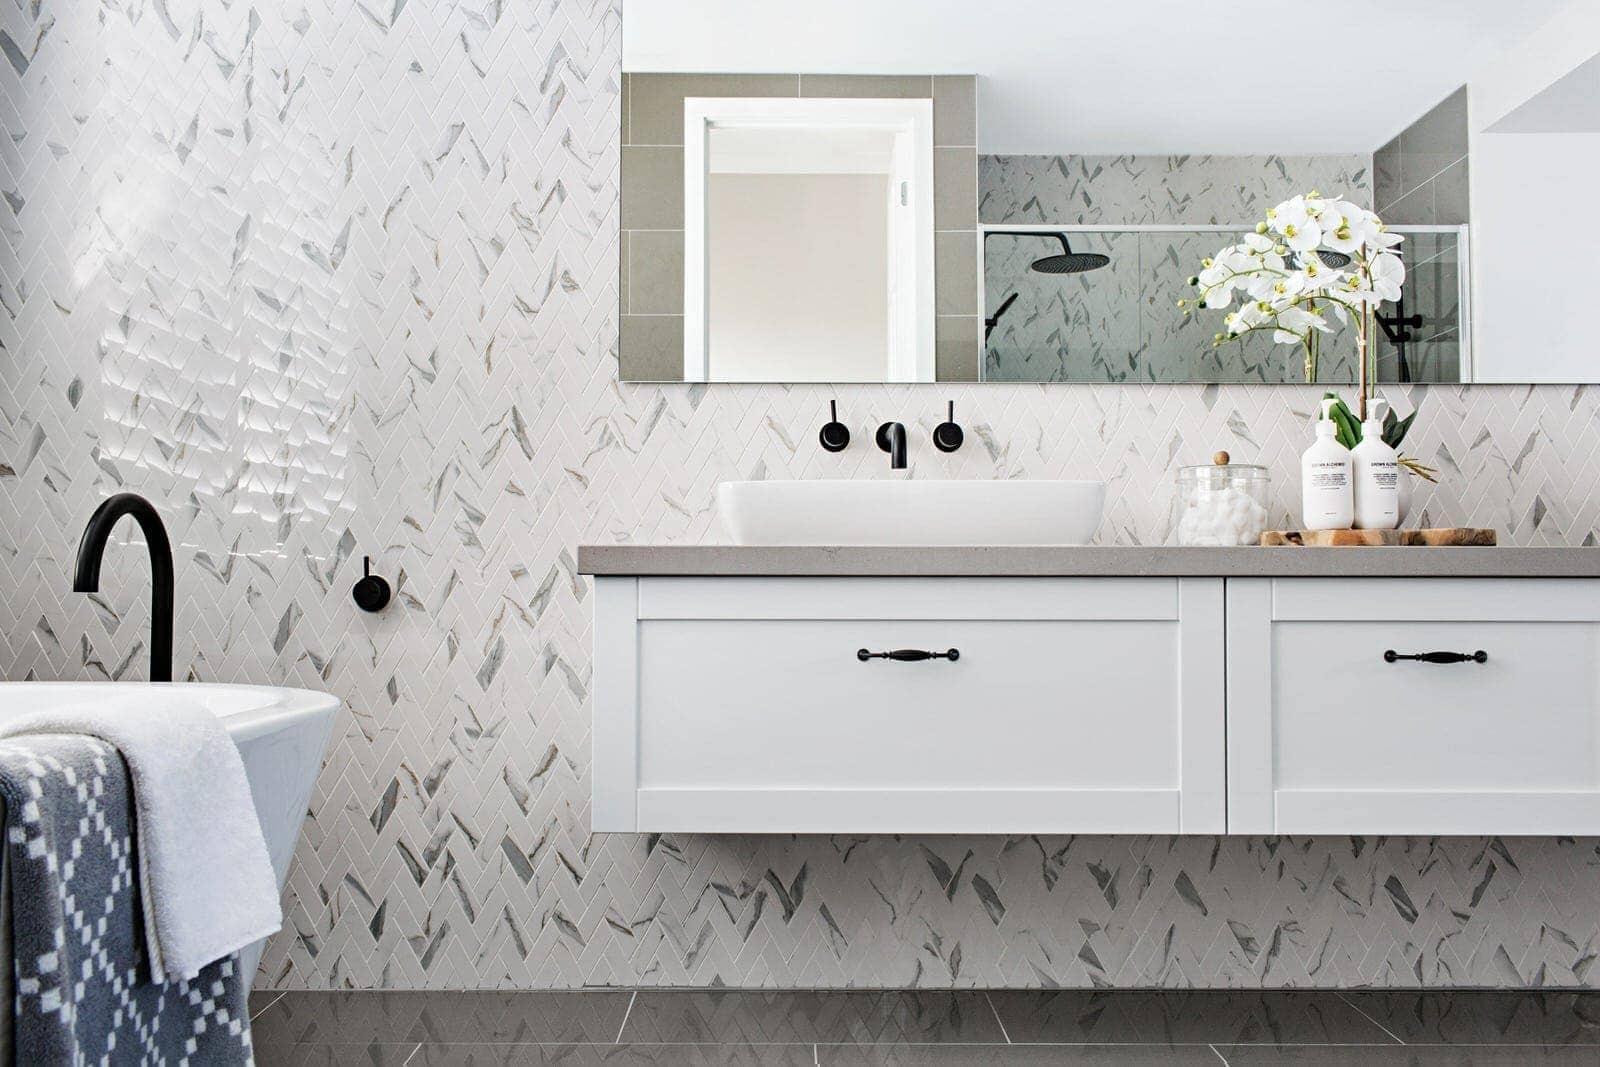 metricon hamptons style bathroom with marble herringbon tiles and floating vanity